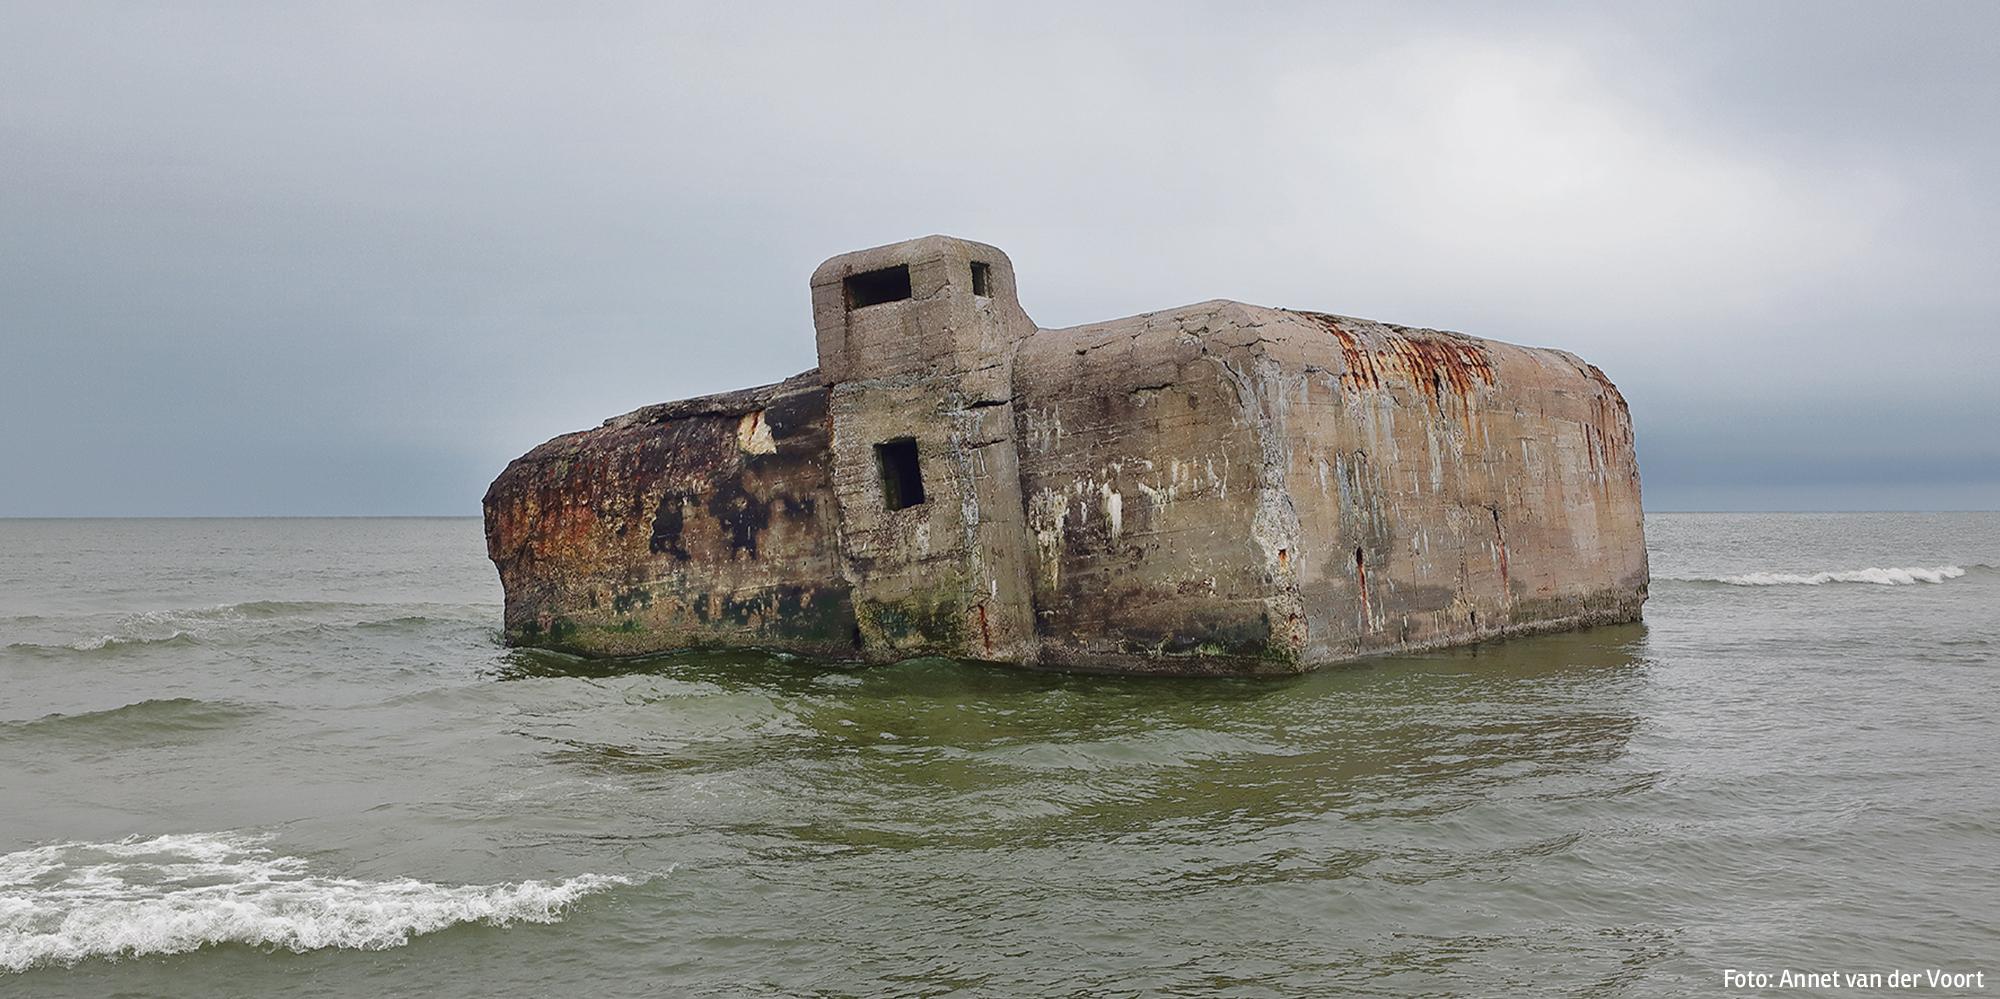 Bunker in Vigsø, Dänemark (Foto: Annet van der Voort)